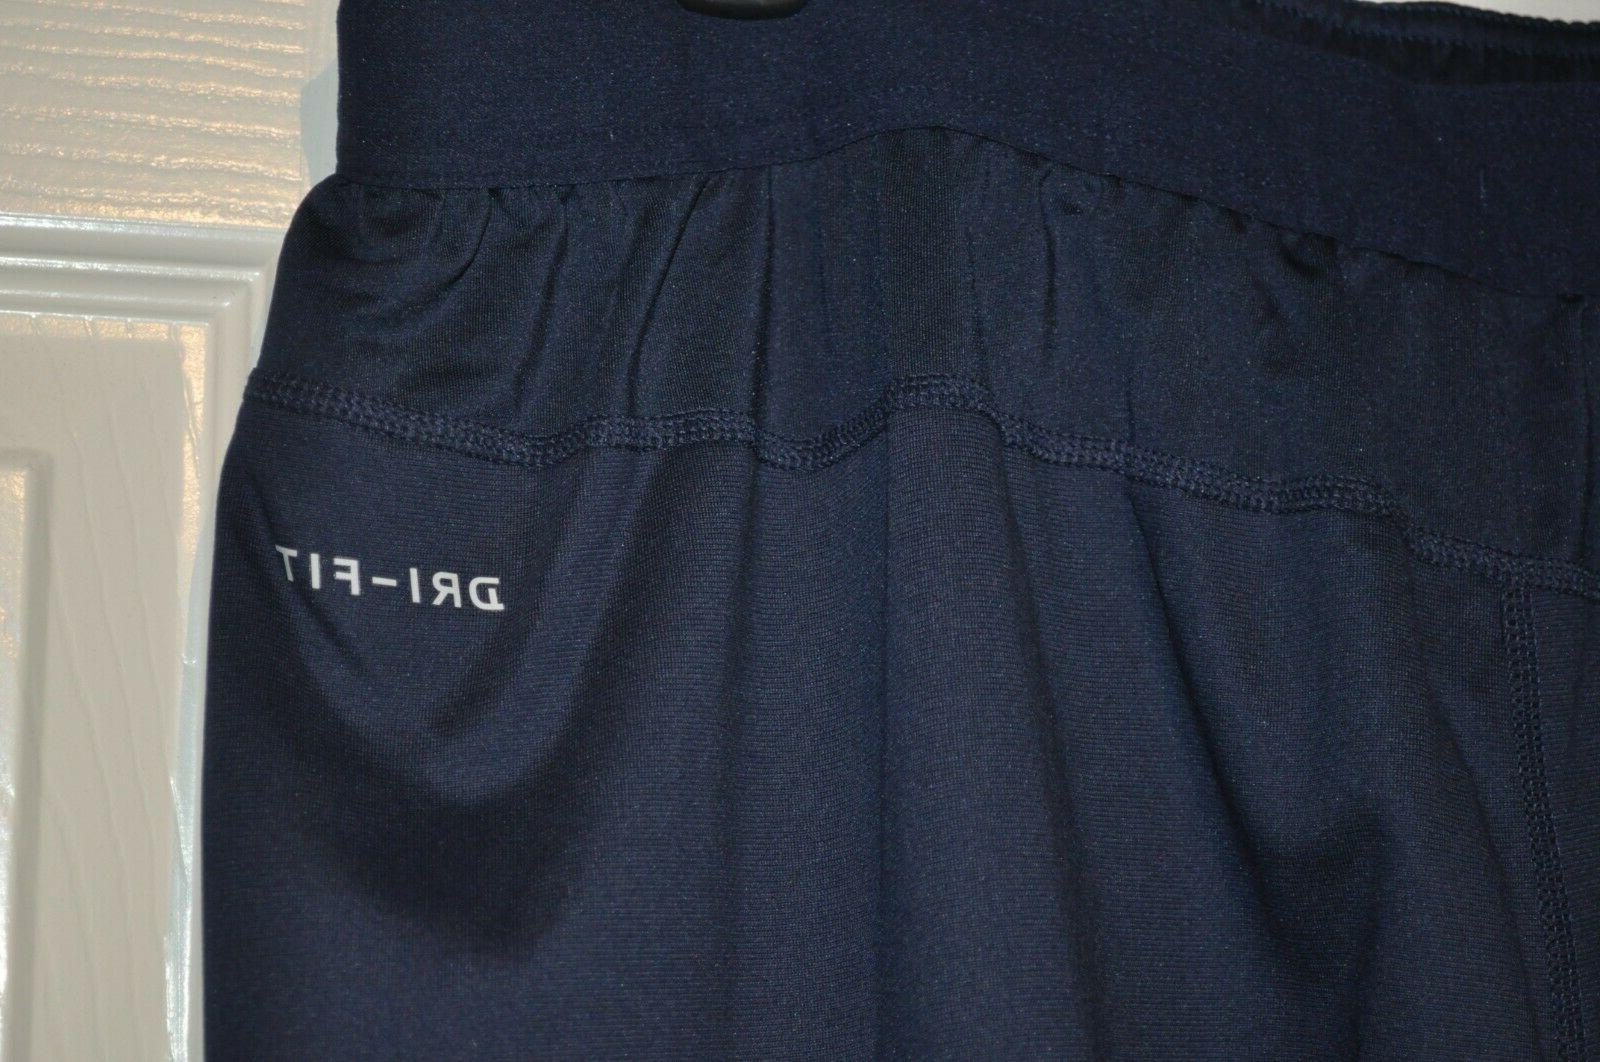 Nike NFL Equipment Pants Navy